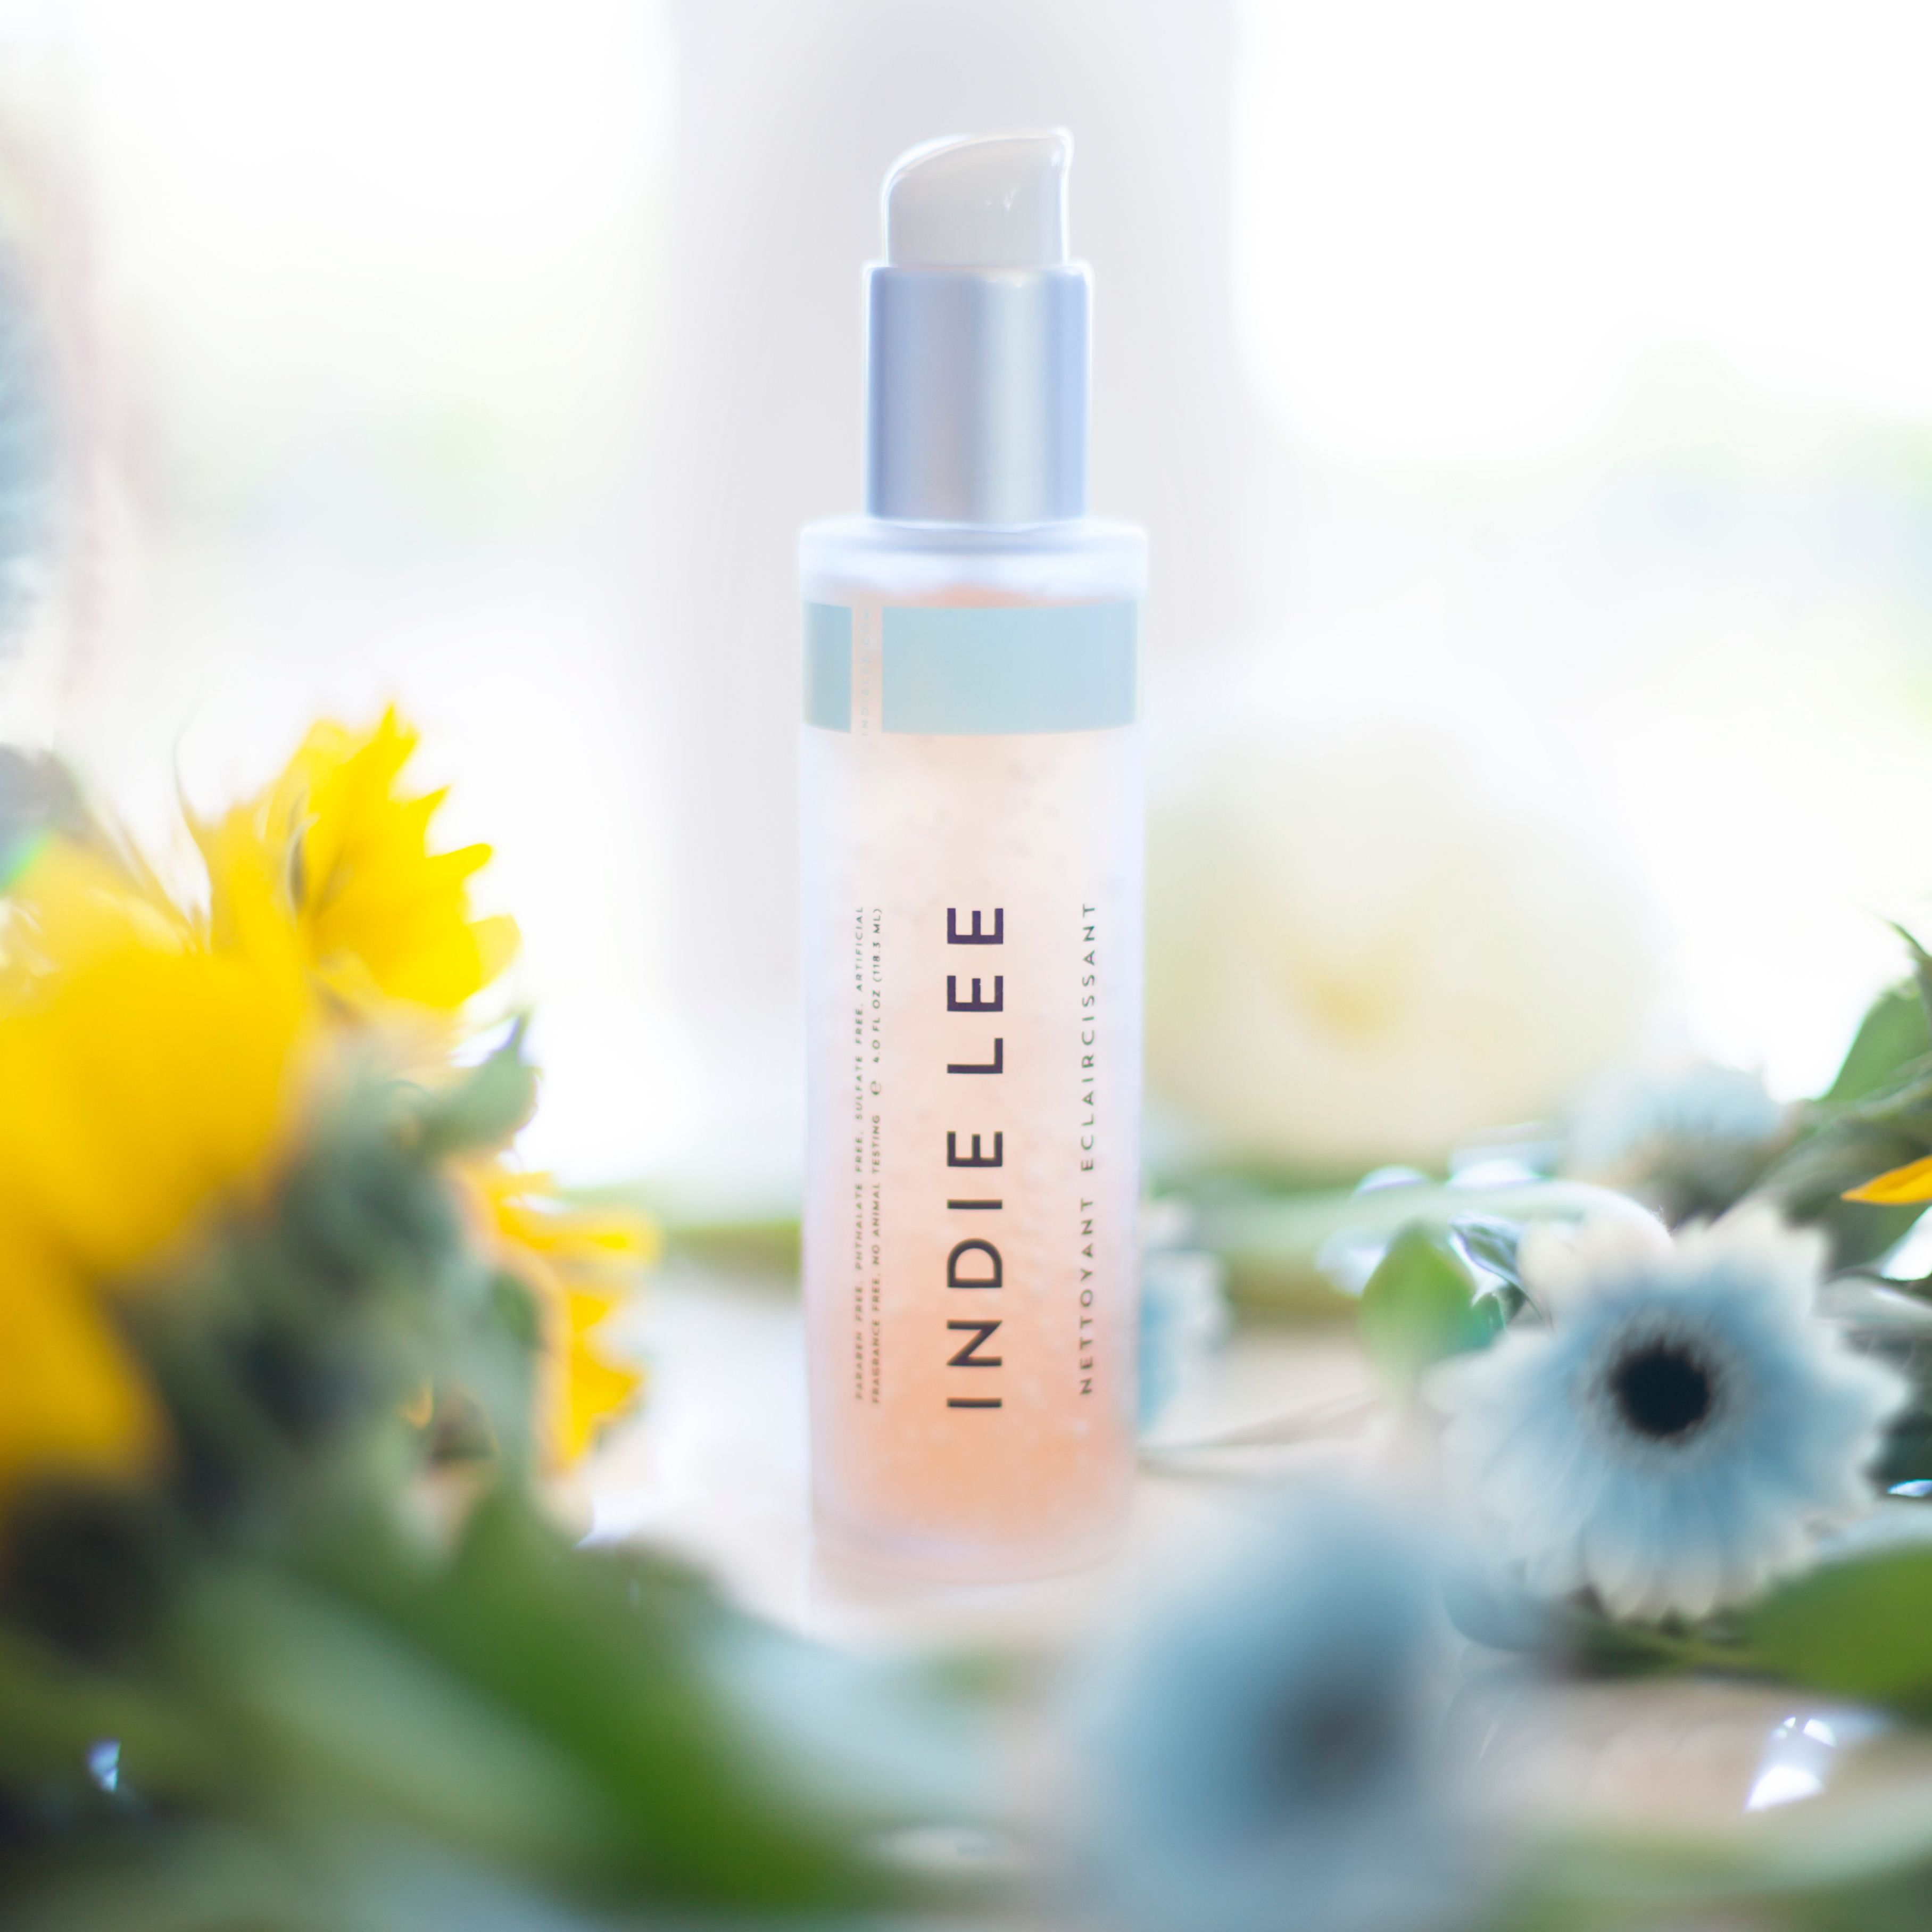 Indie Lee Brightening Cleanser skincare greenbeauty